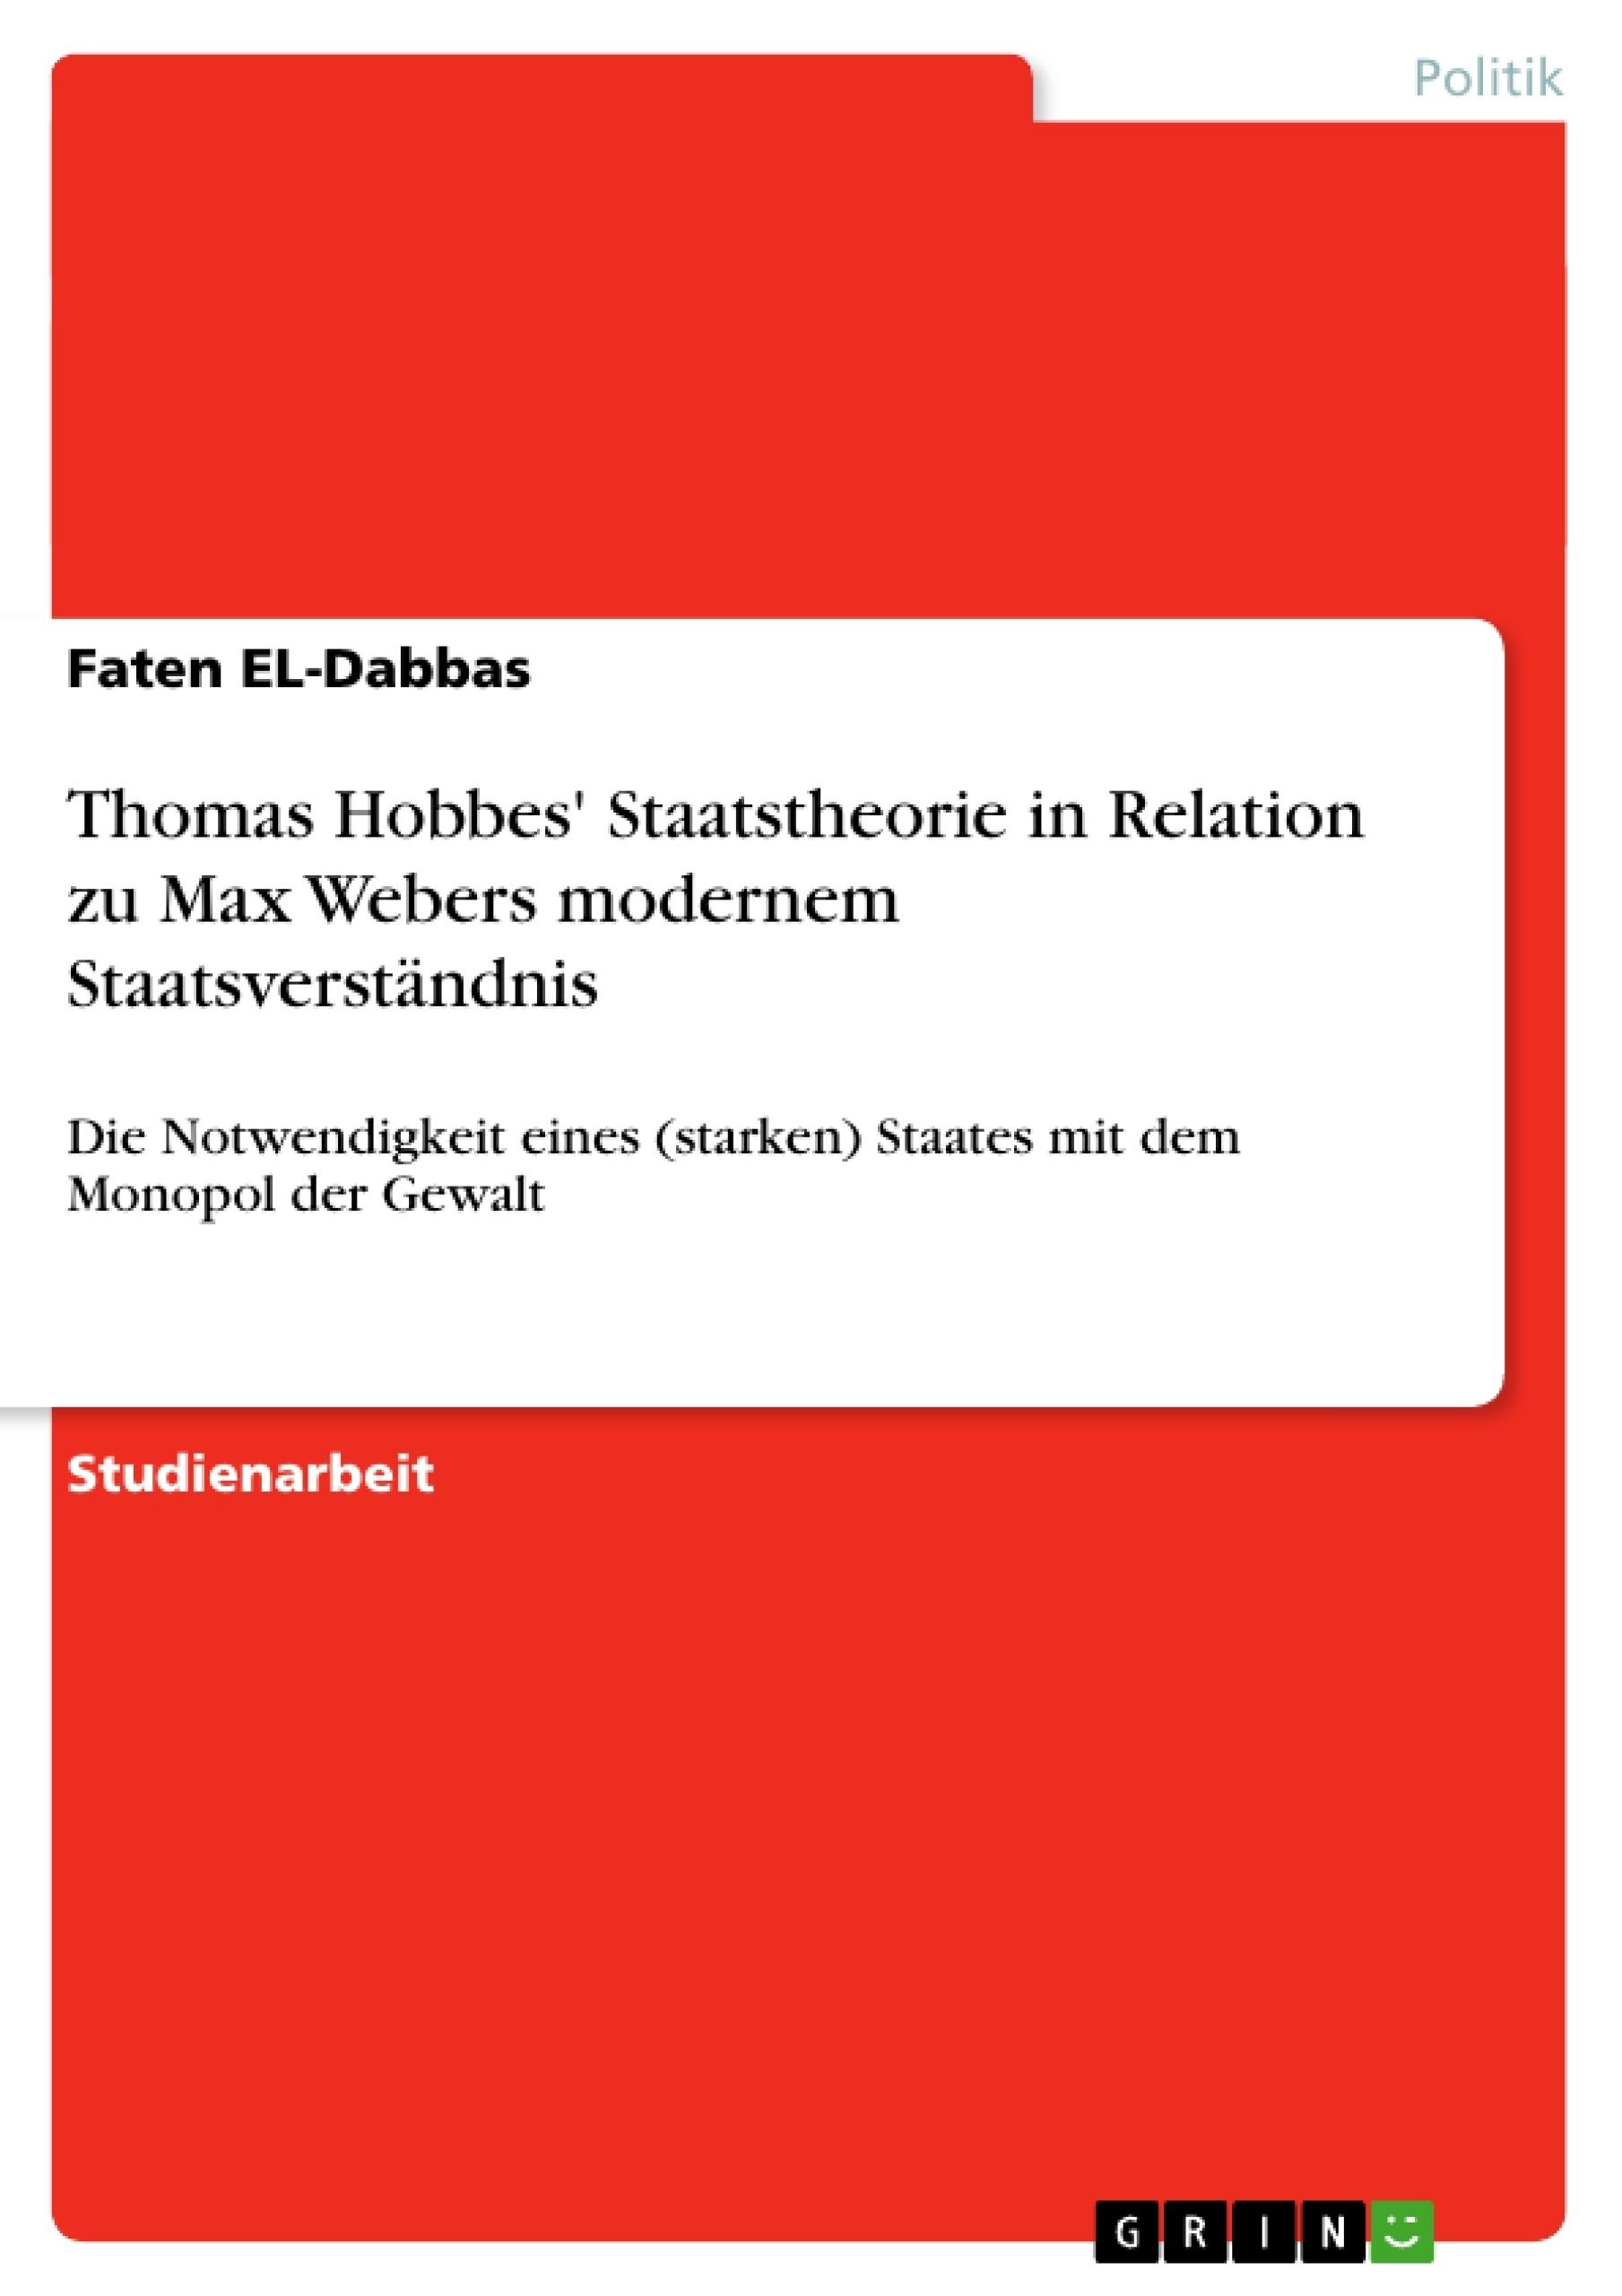 Titel: Thomas Hobbes' Staatstheorie in Relation zu Max Webers modernem Staatsverständnis